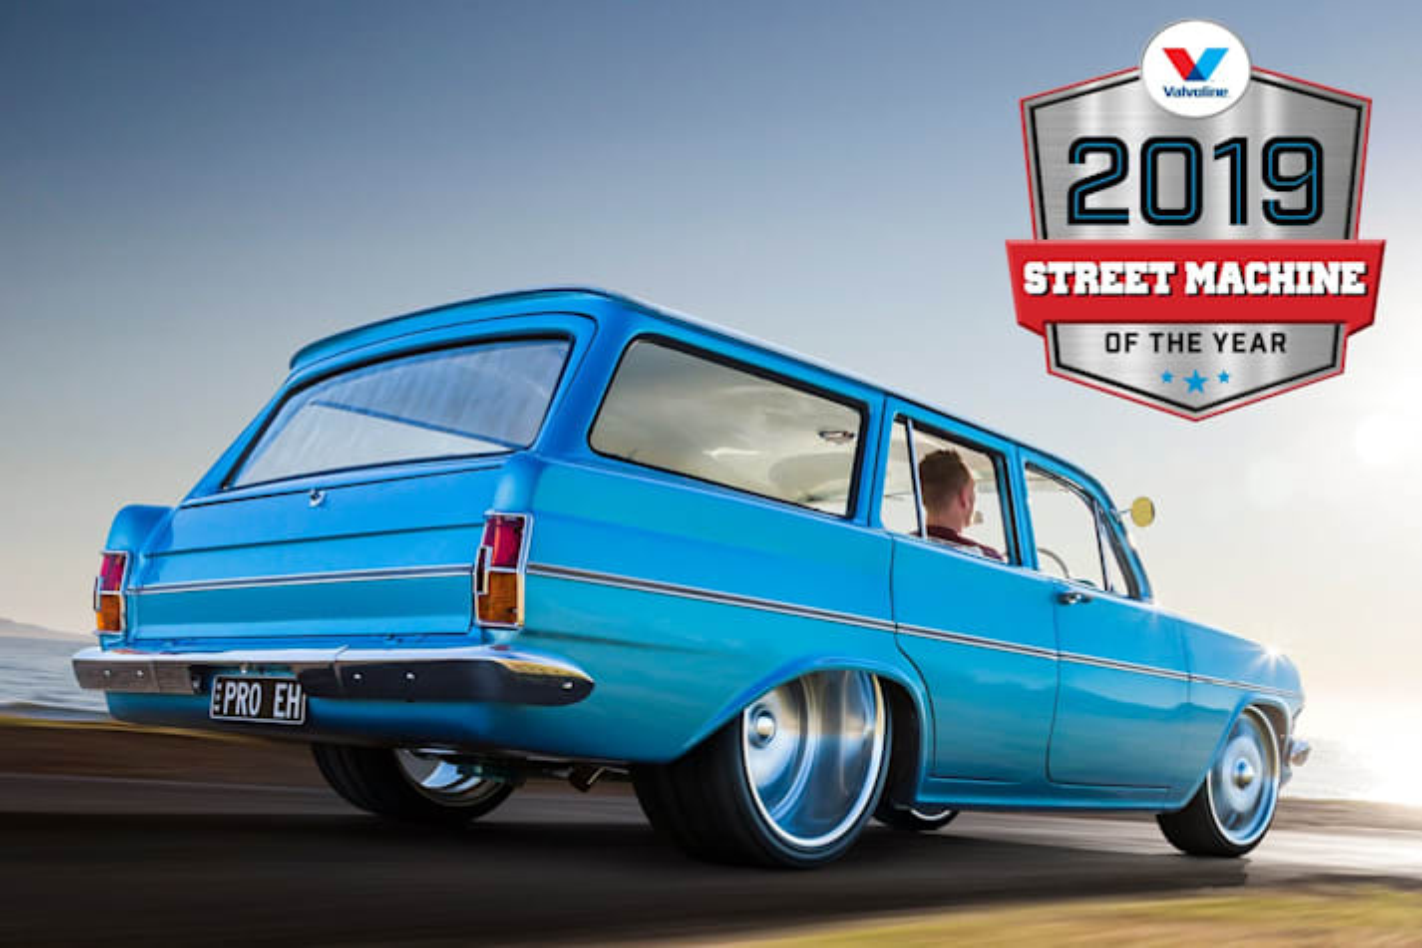 Street Machine of the Year 2019 Final Round